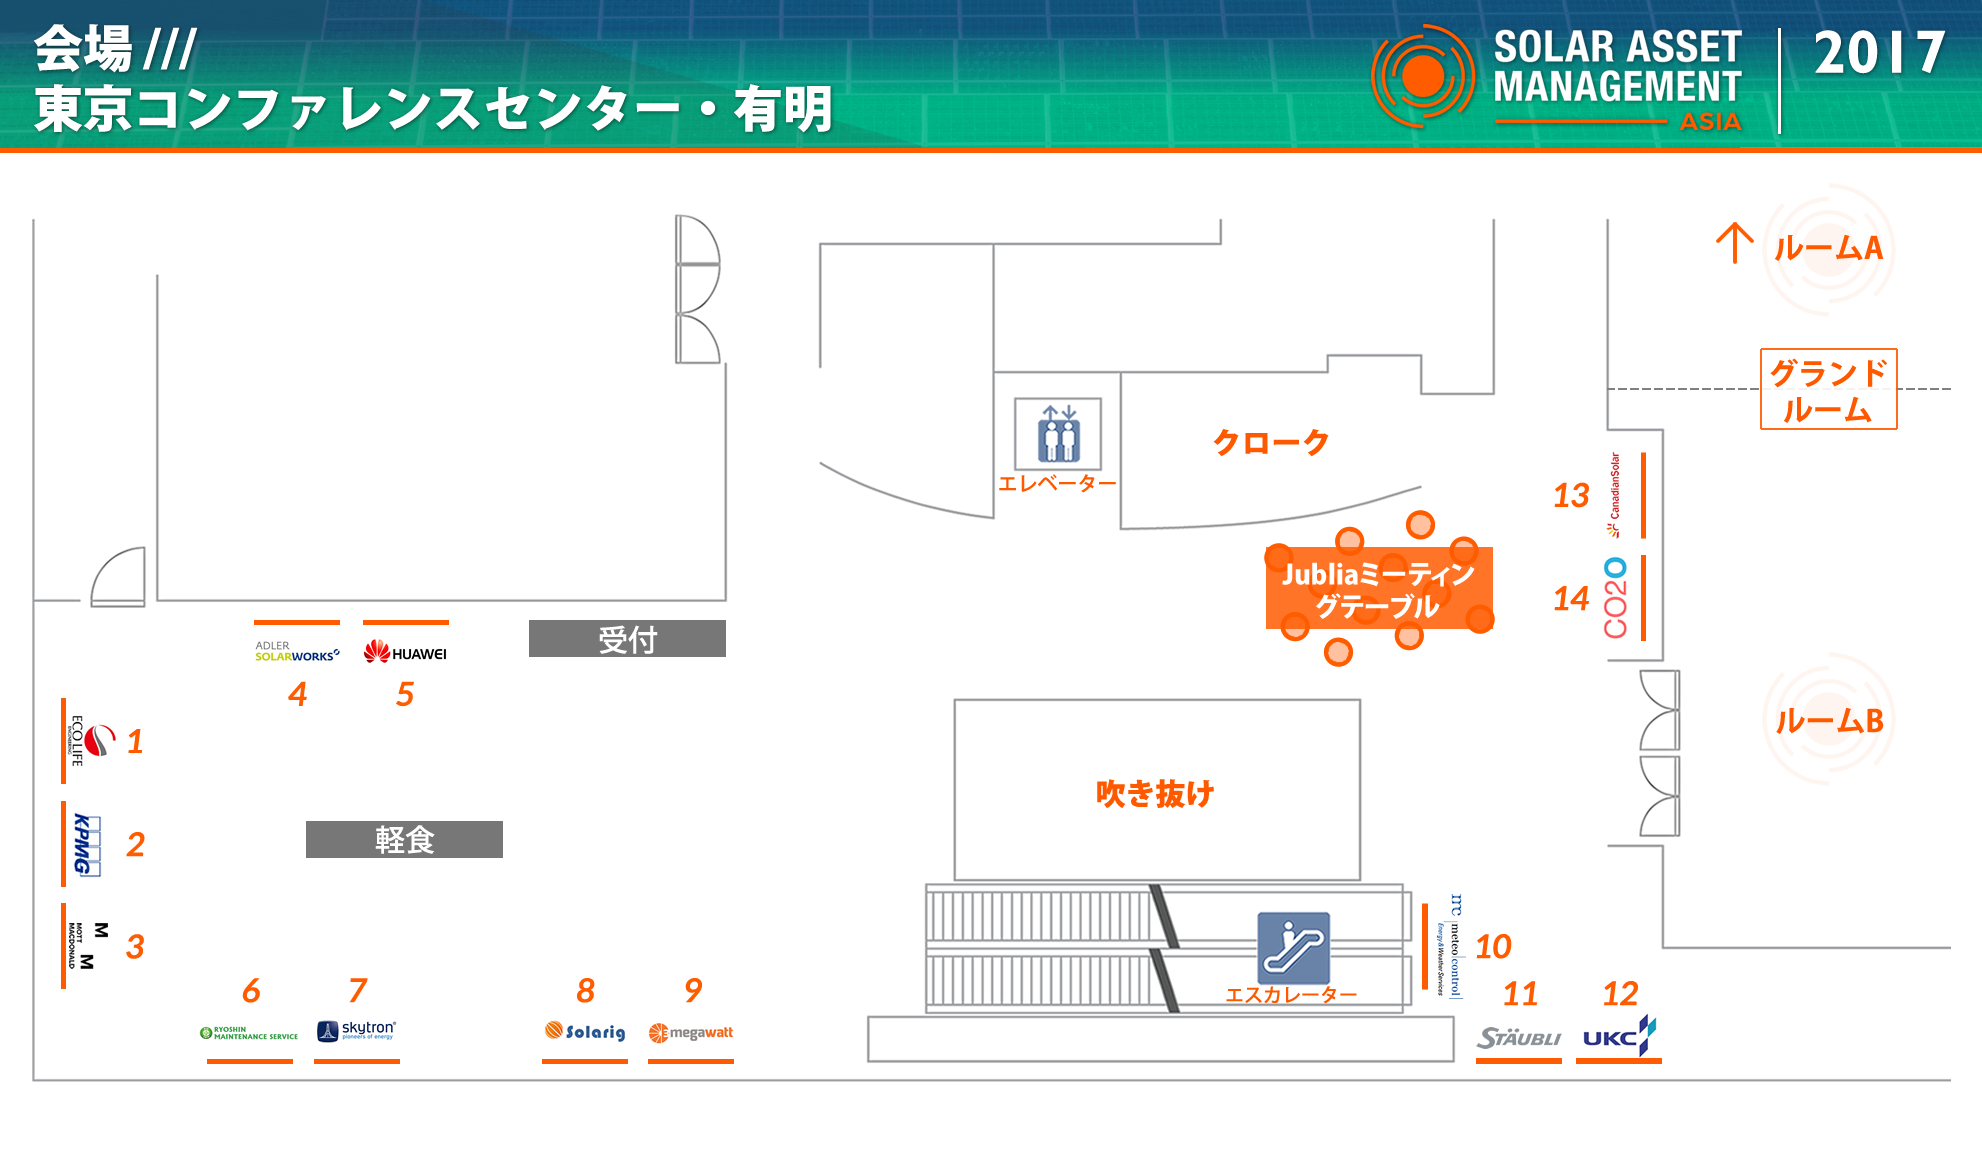 SAM Asia Floorplan 2017